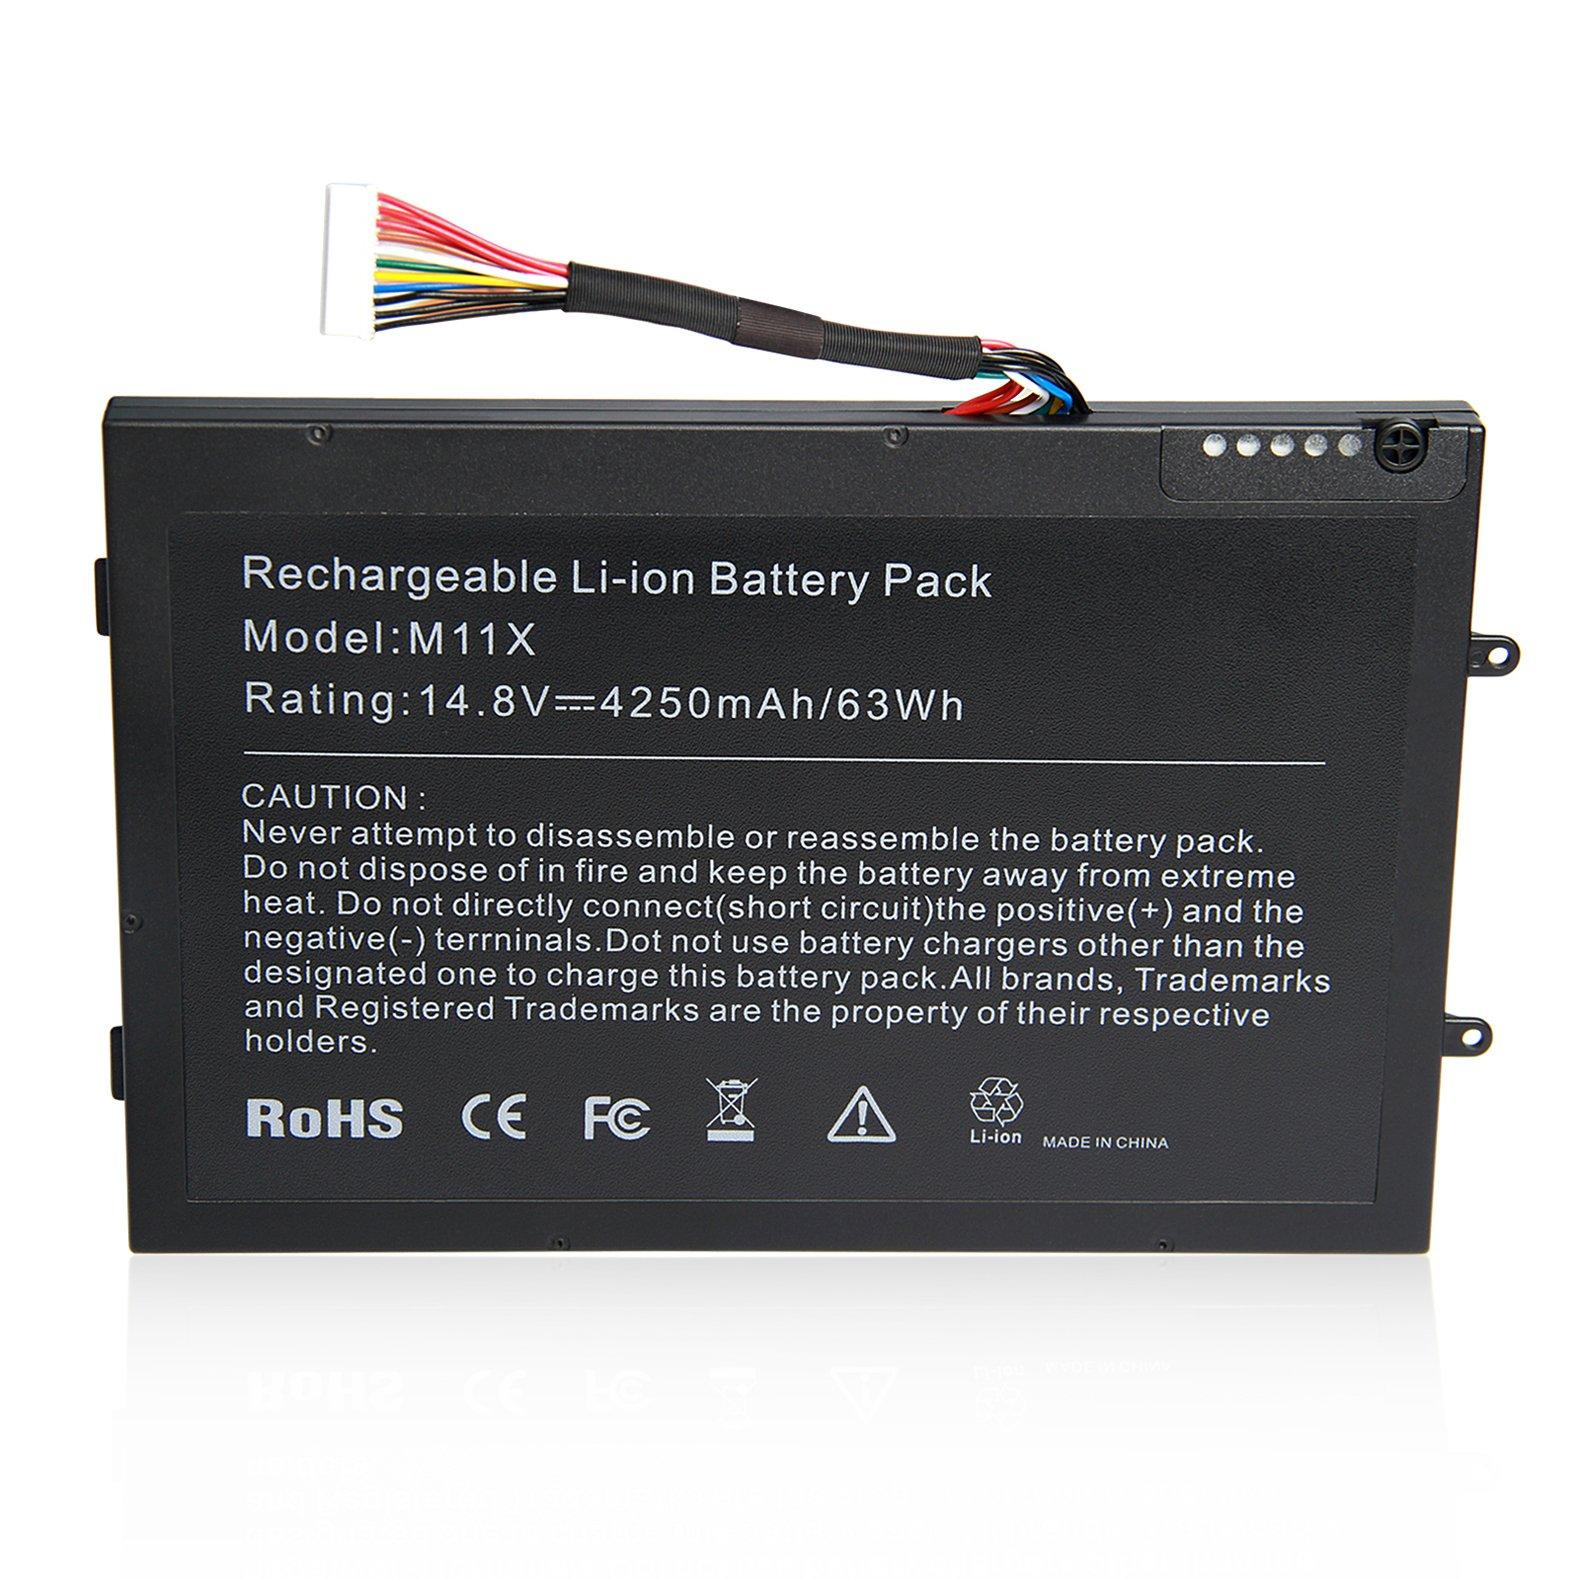 ARyee M11X R3 M14X R2 Battery for Dell Alienware New Laptop Replacement Fit Alienware M11x R2 R3 M14X R2 P18G P06T 312-0984 8P6X6 999T2086F DKK25 KR08P6X6[14.8 63Wh]